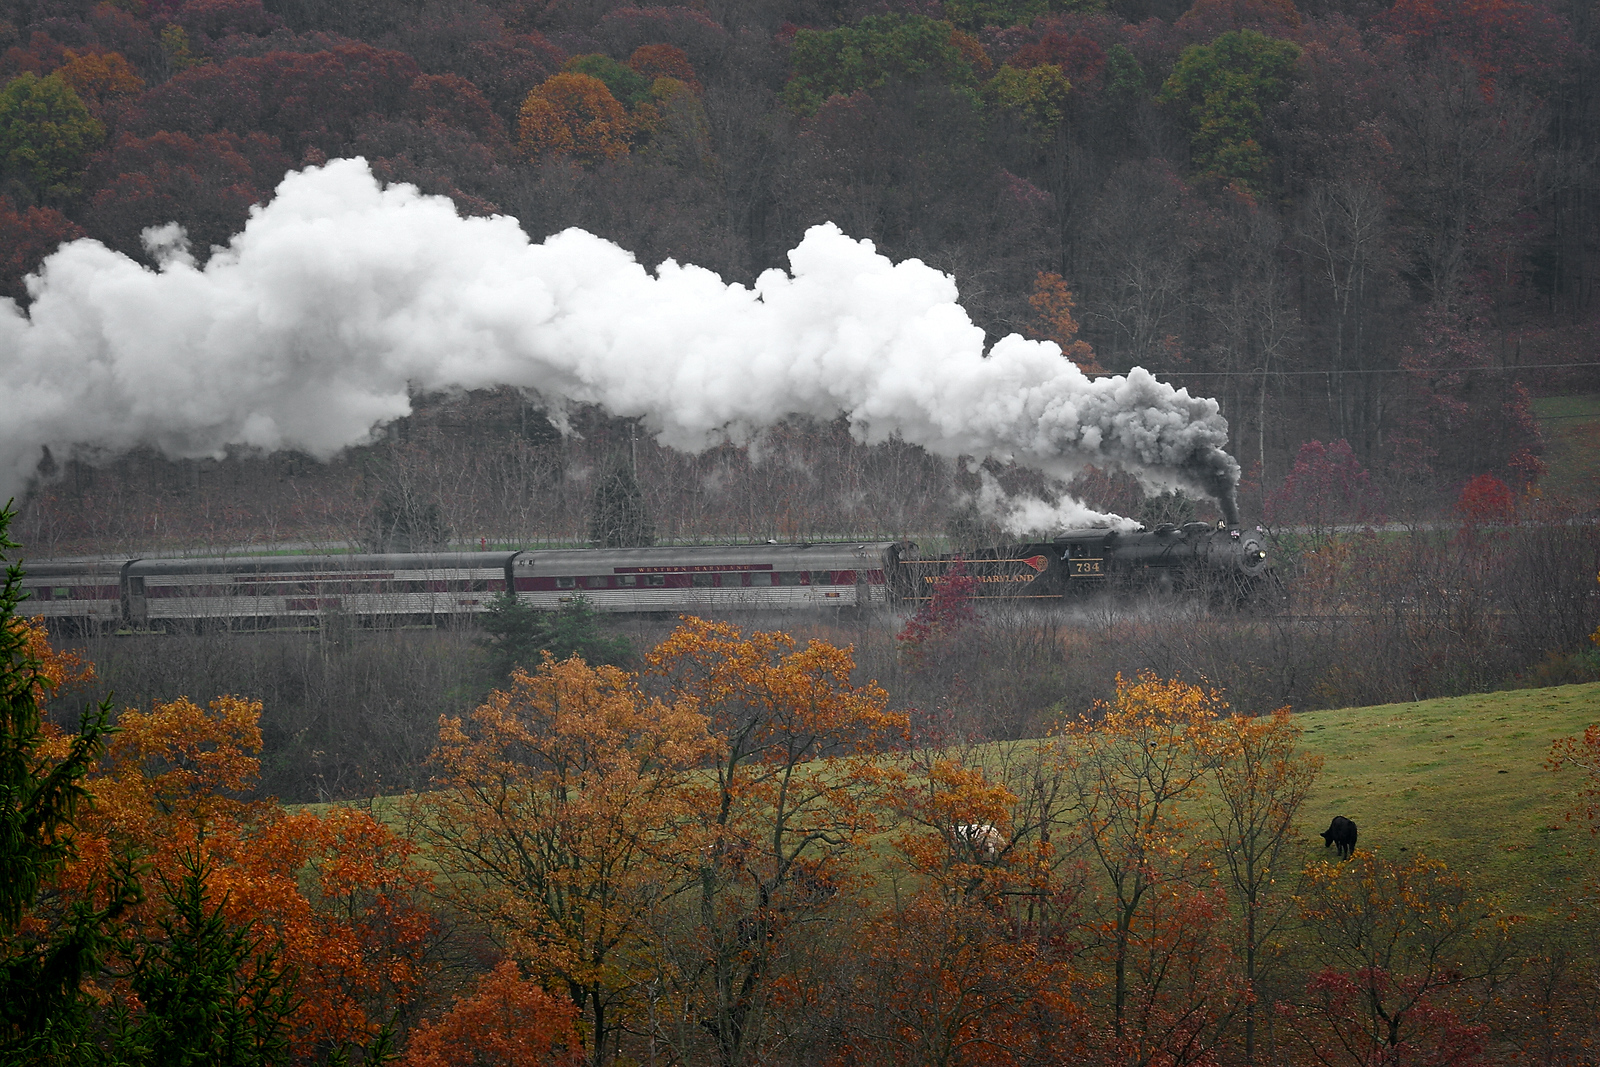 WMSR rainy day steam trail Western Maryland Scenic Railroad